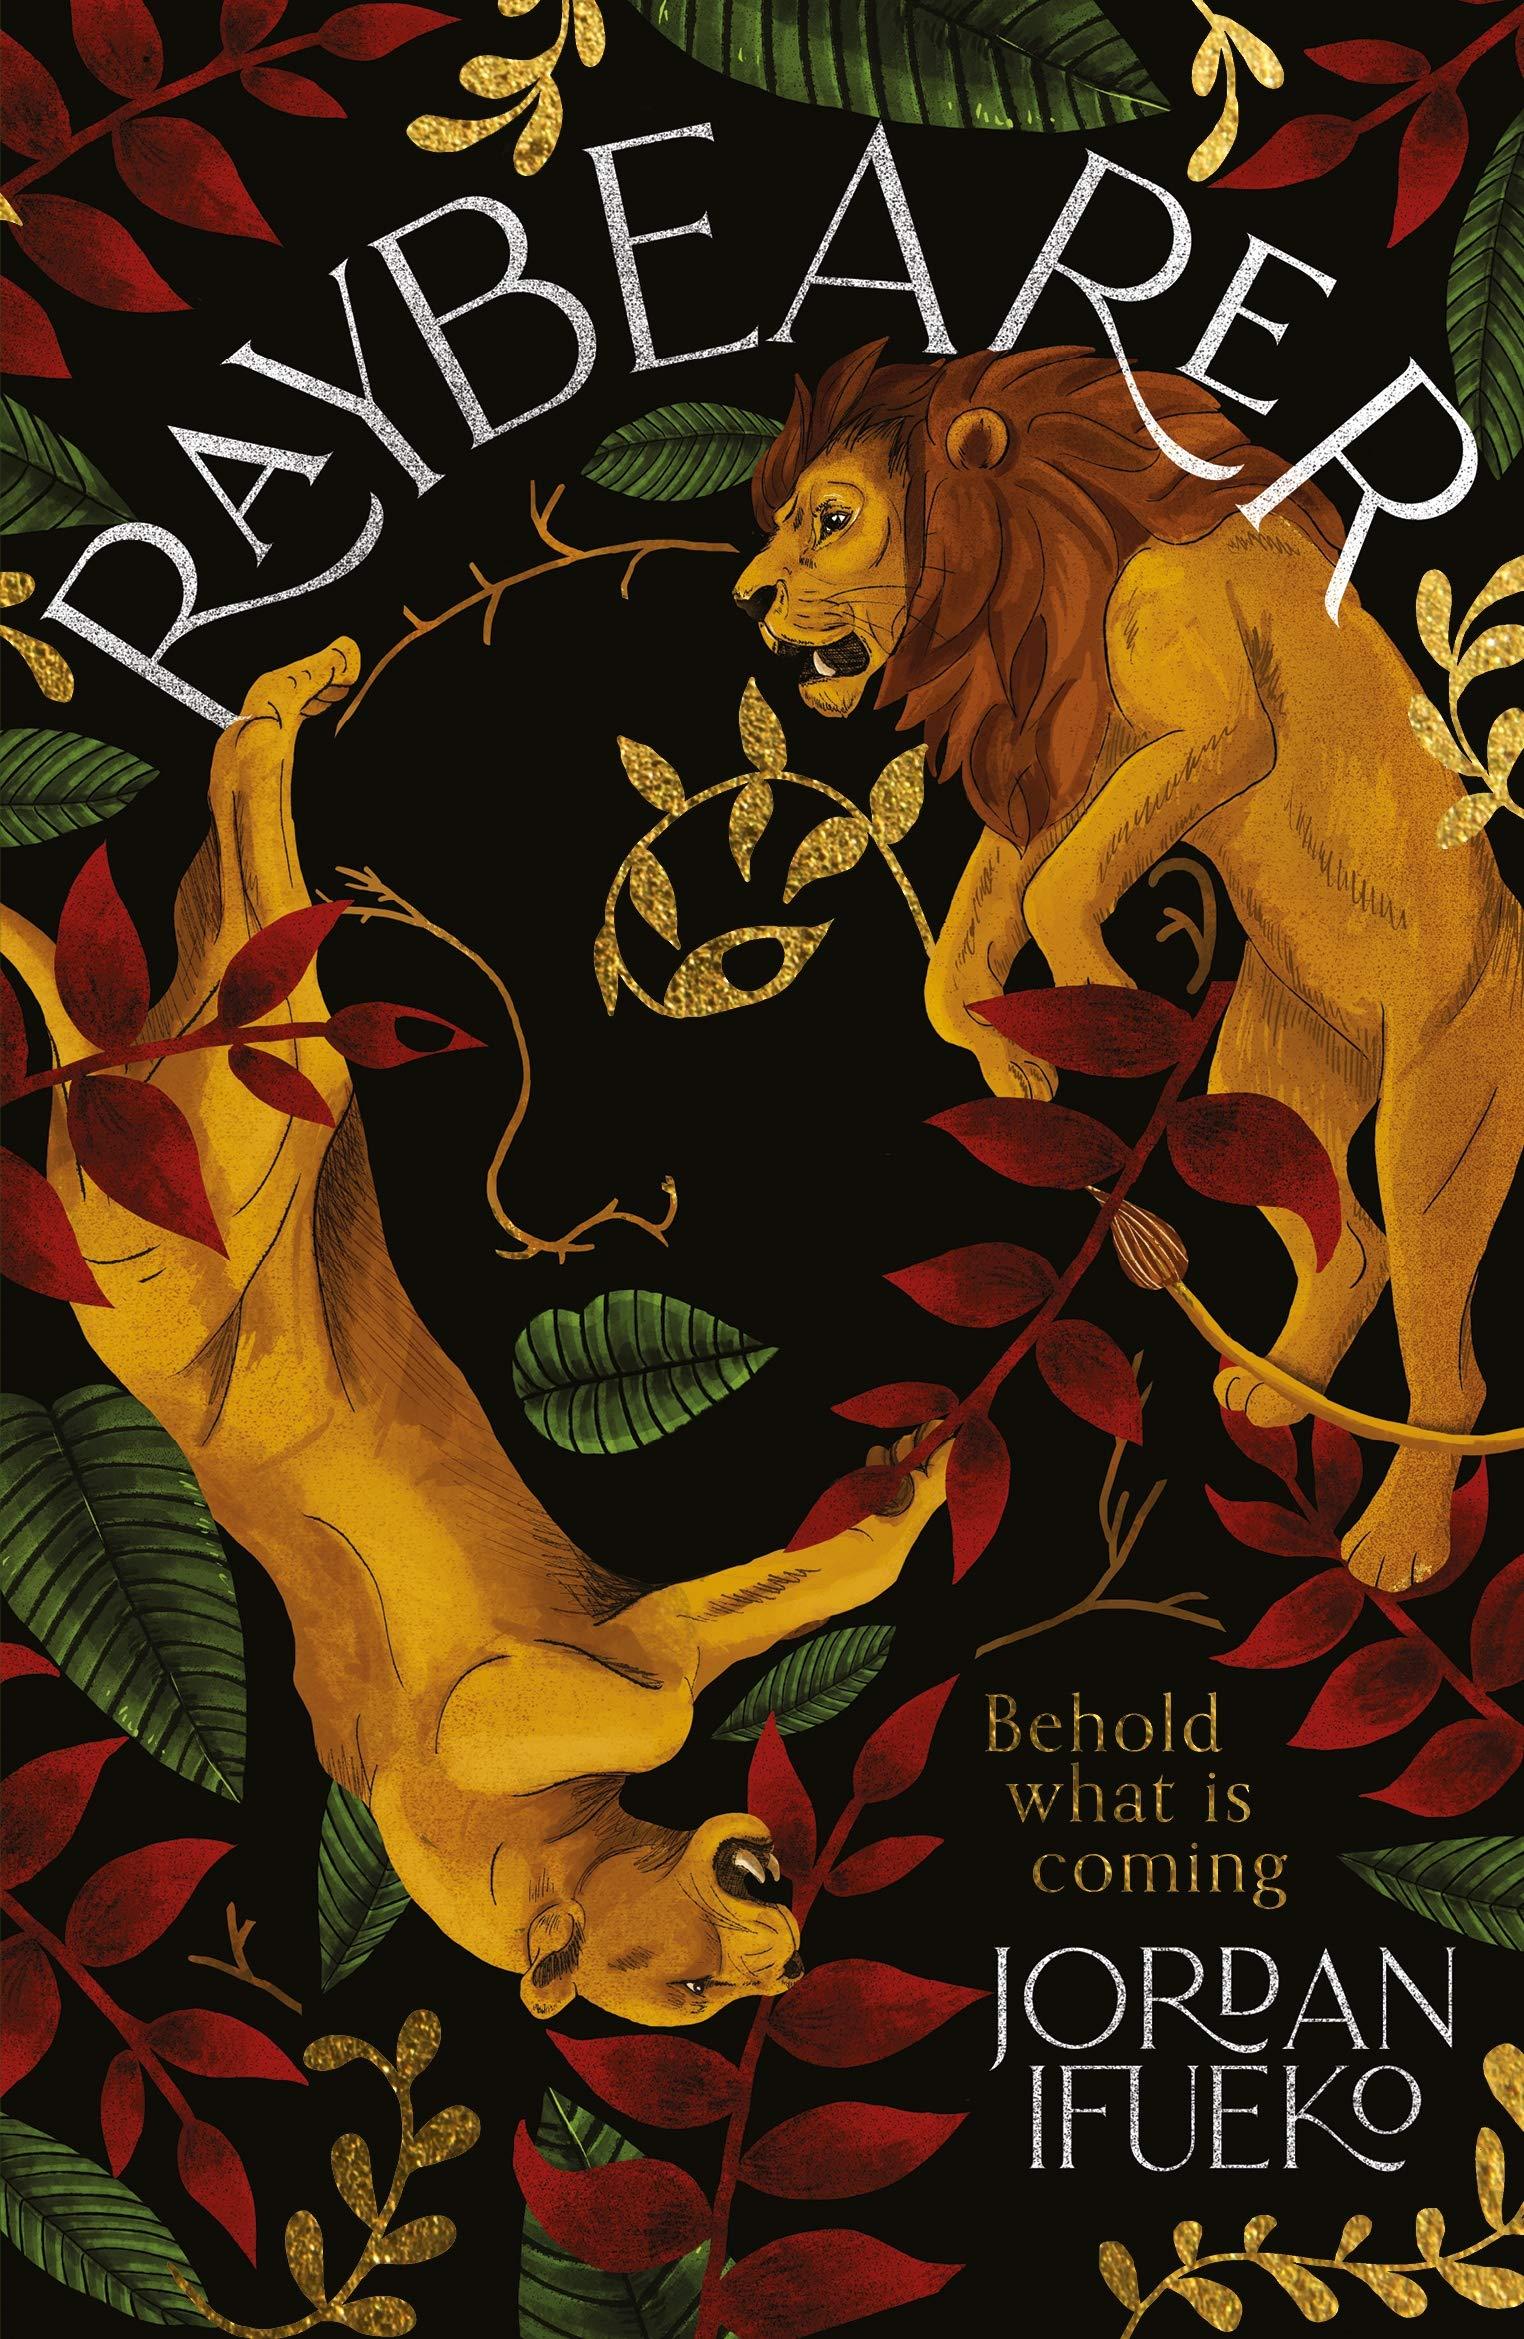 Raybearer: The epic and phenomenal New York Times bestselling YA fantasy :  Ifueko, Jordan: Amazon.co.uk: Books